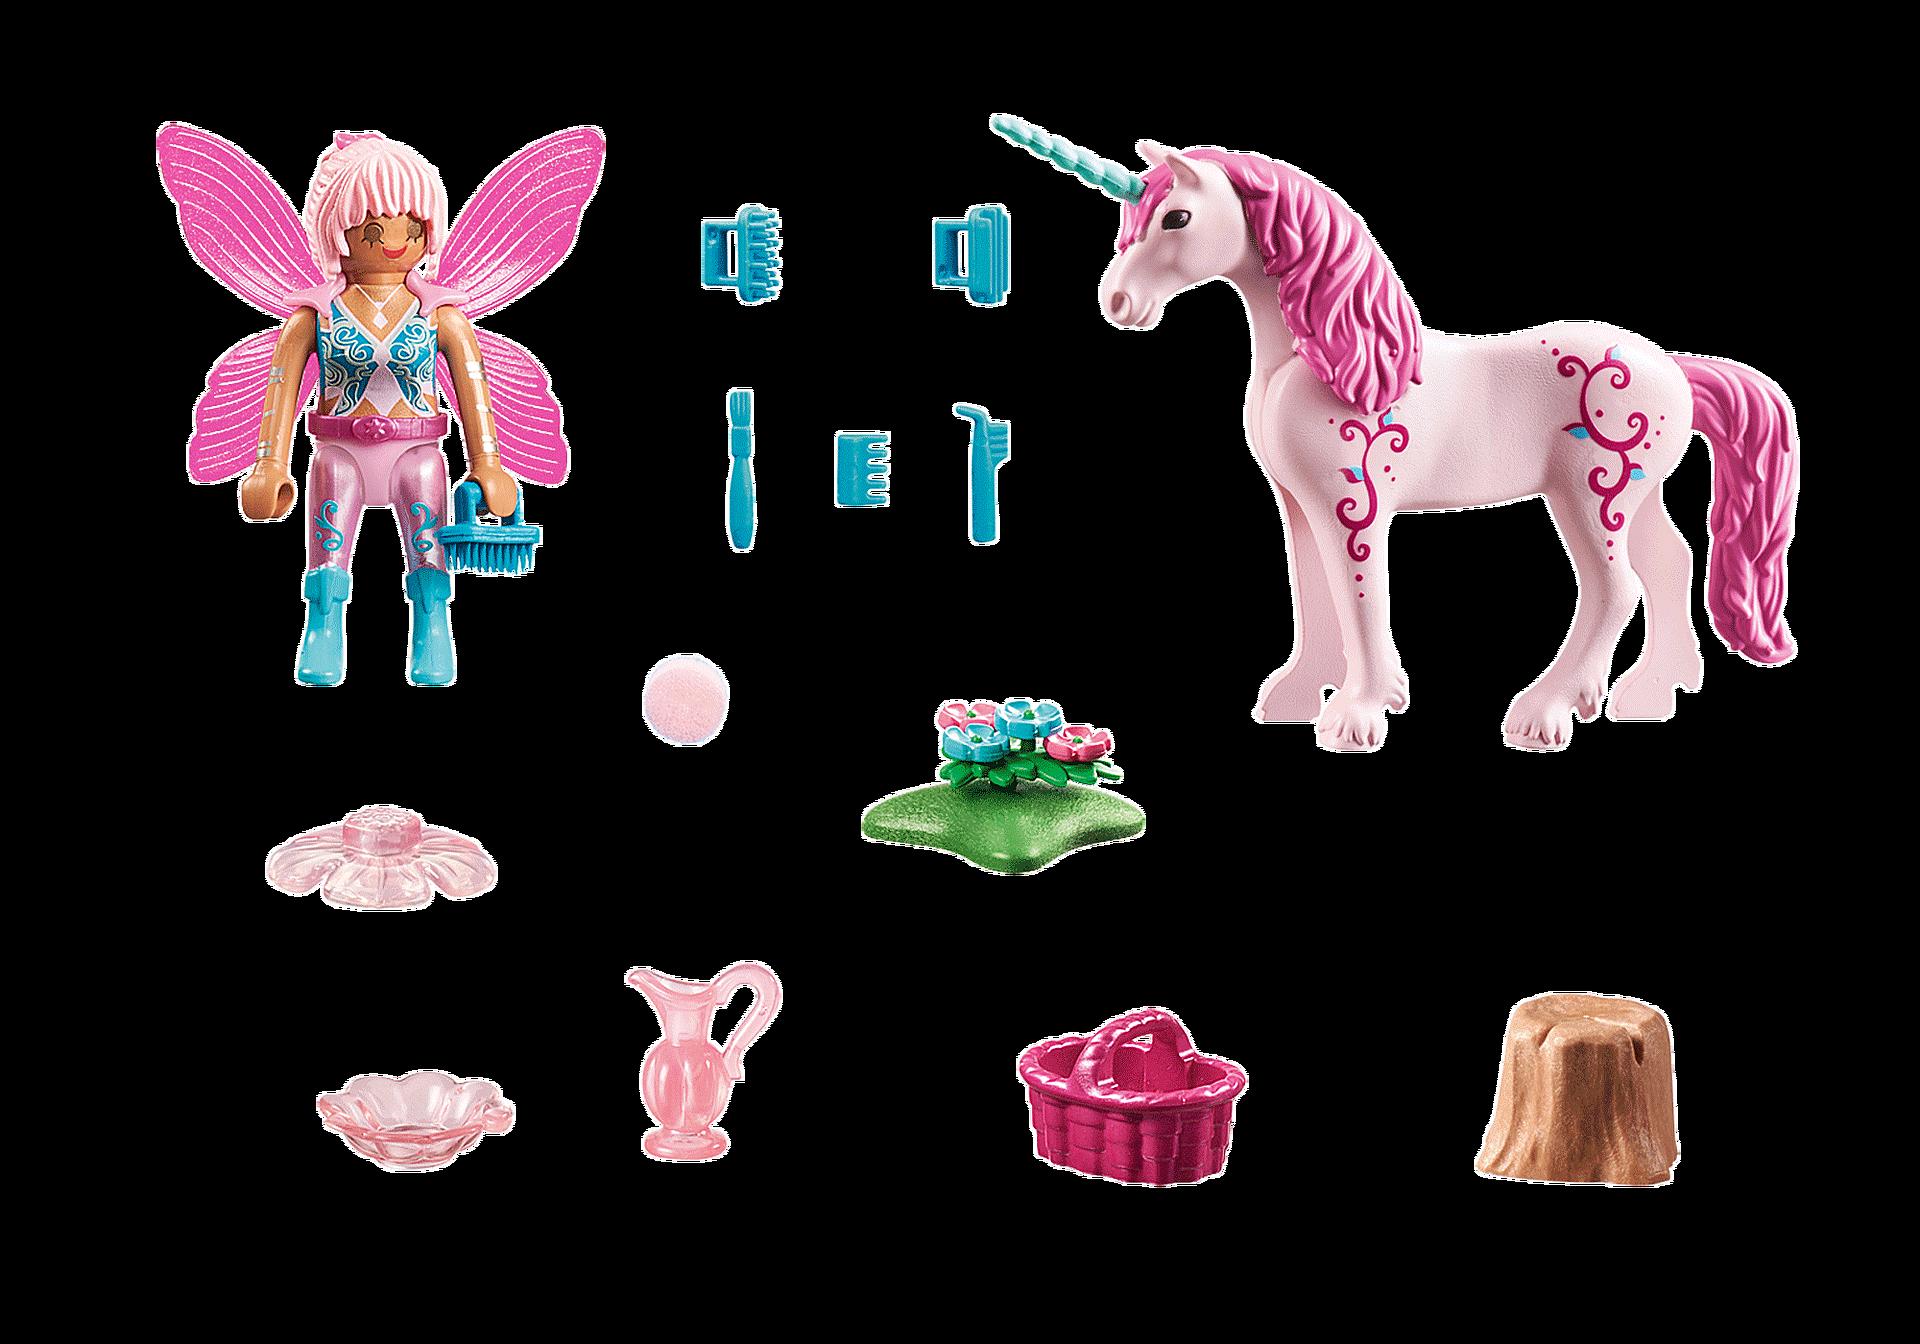 70658 Caretaker Fairy with Unicorn zoom image3